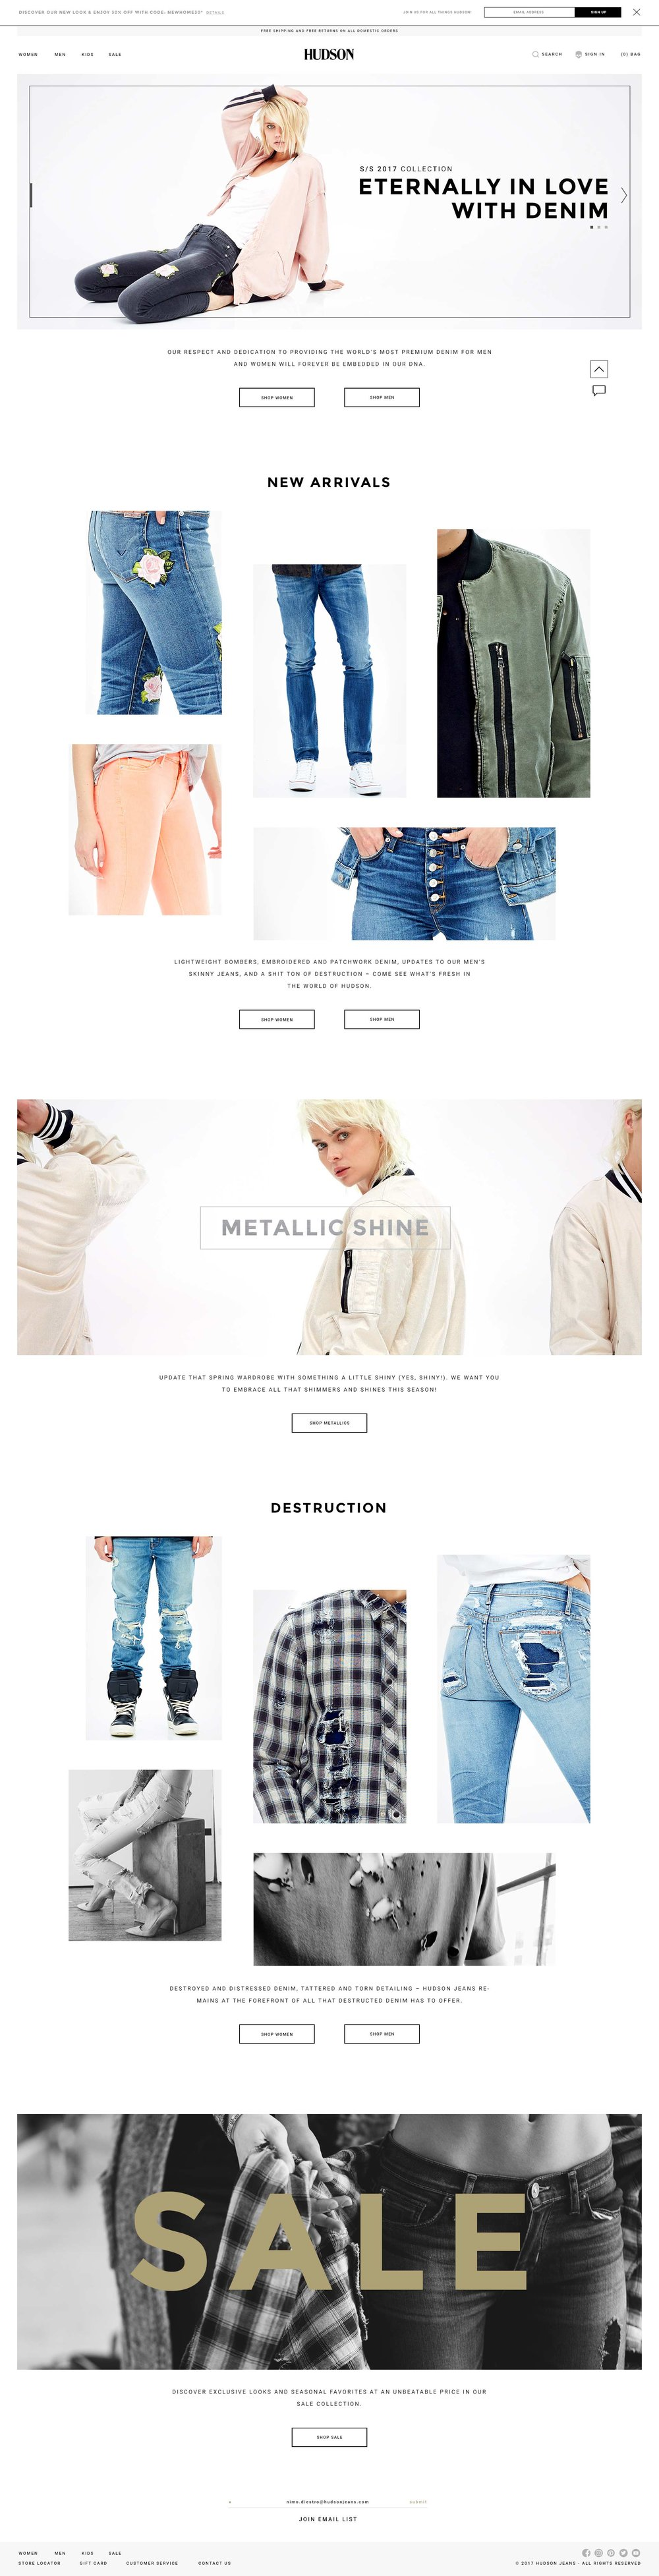 hj-homepage.jpg